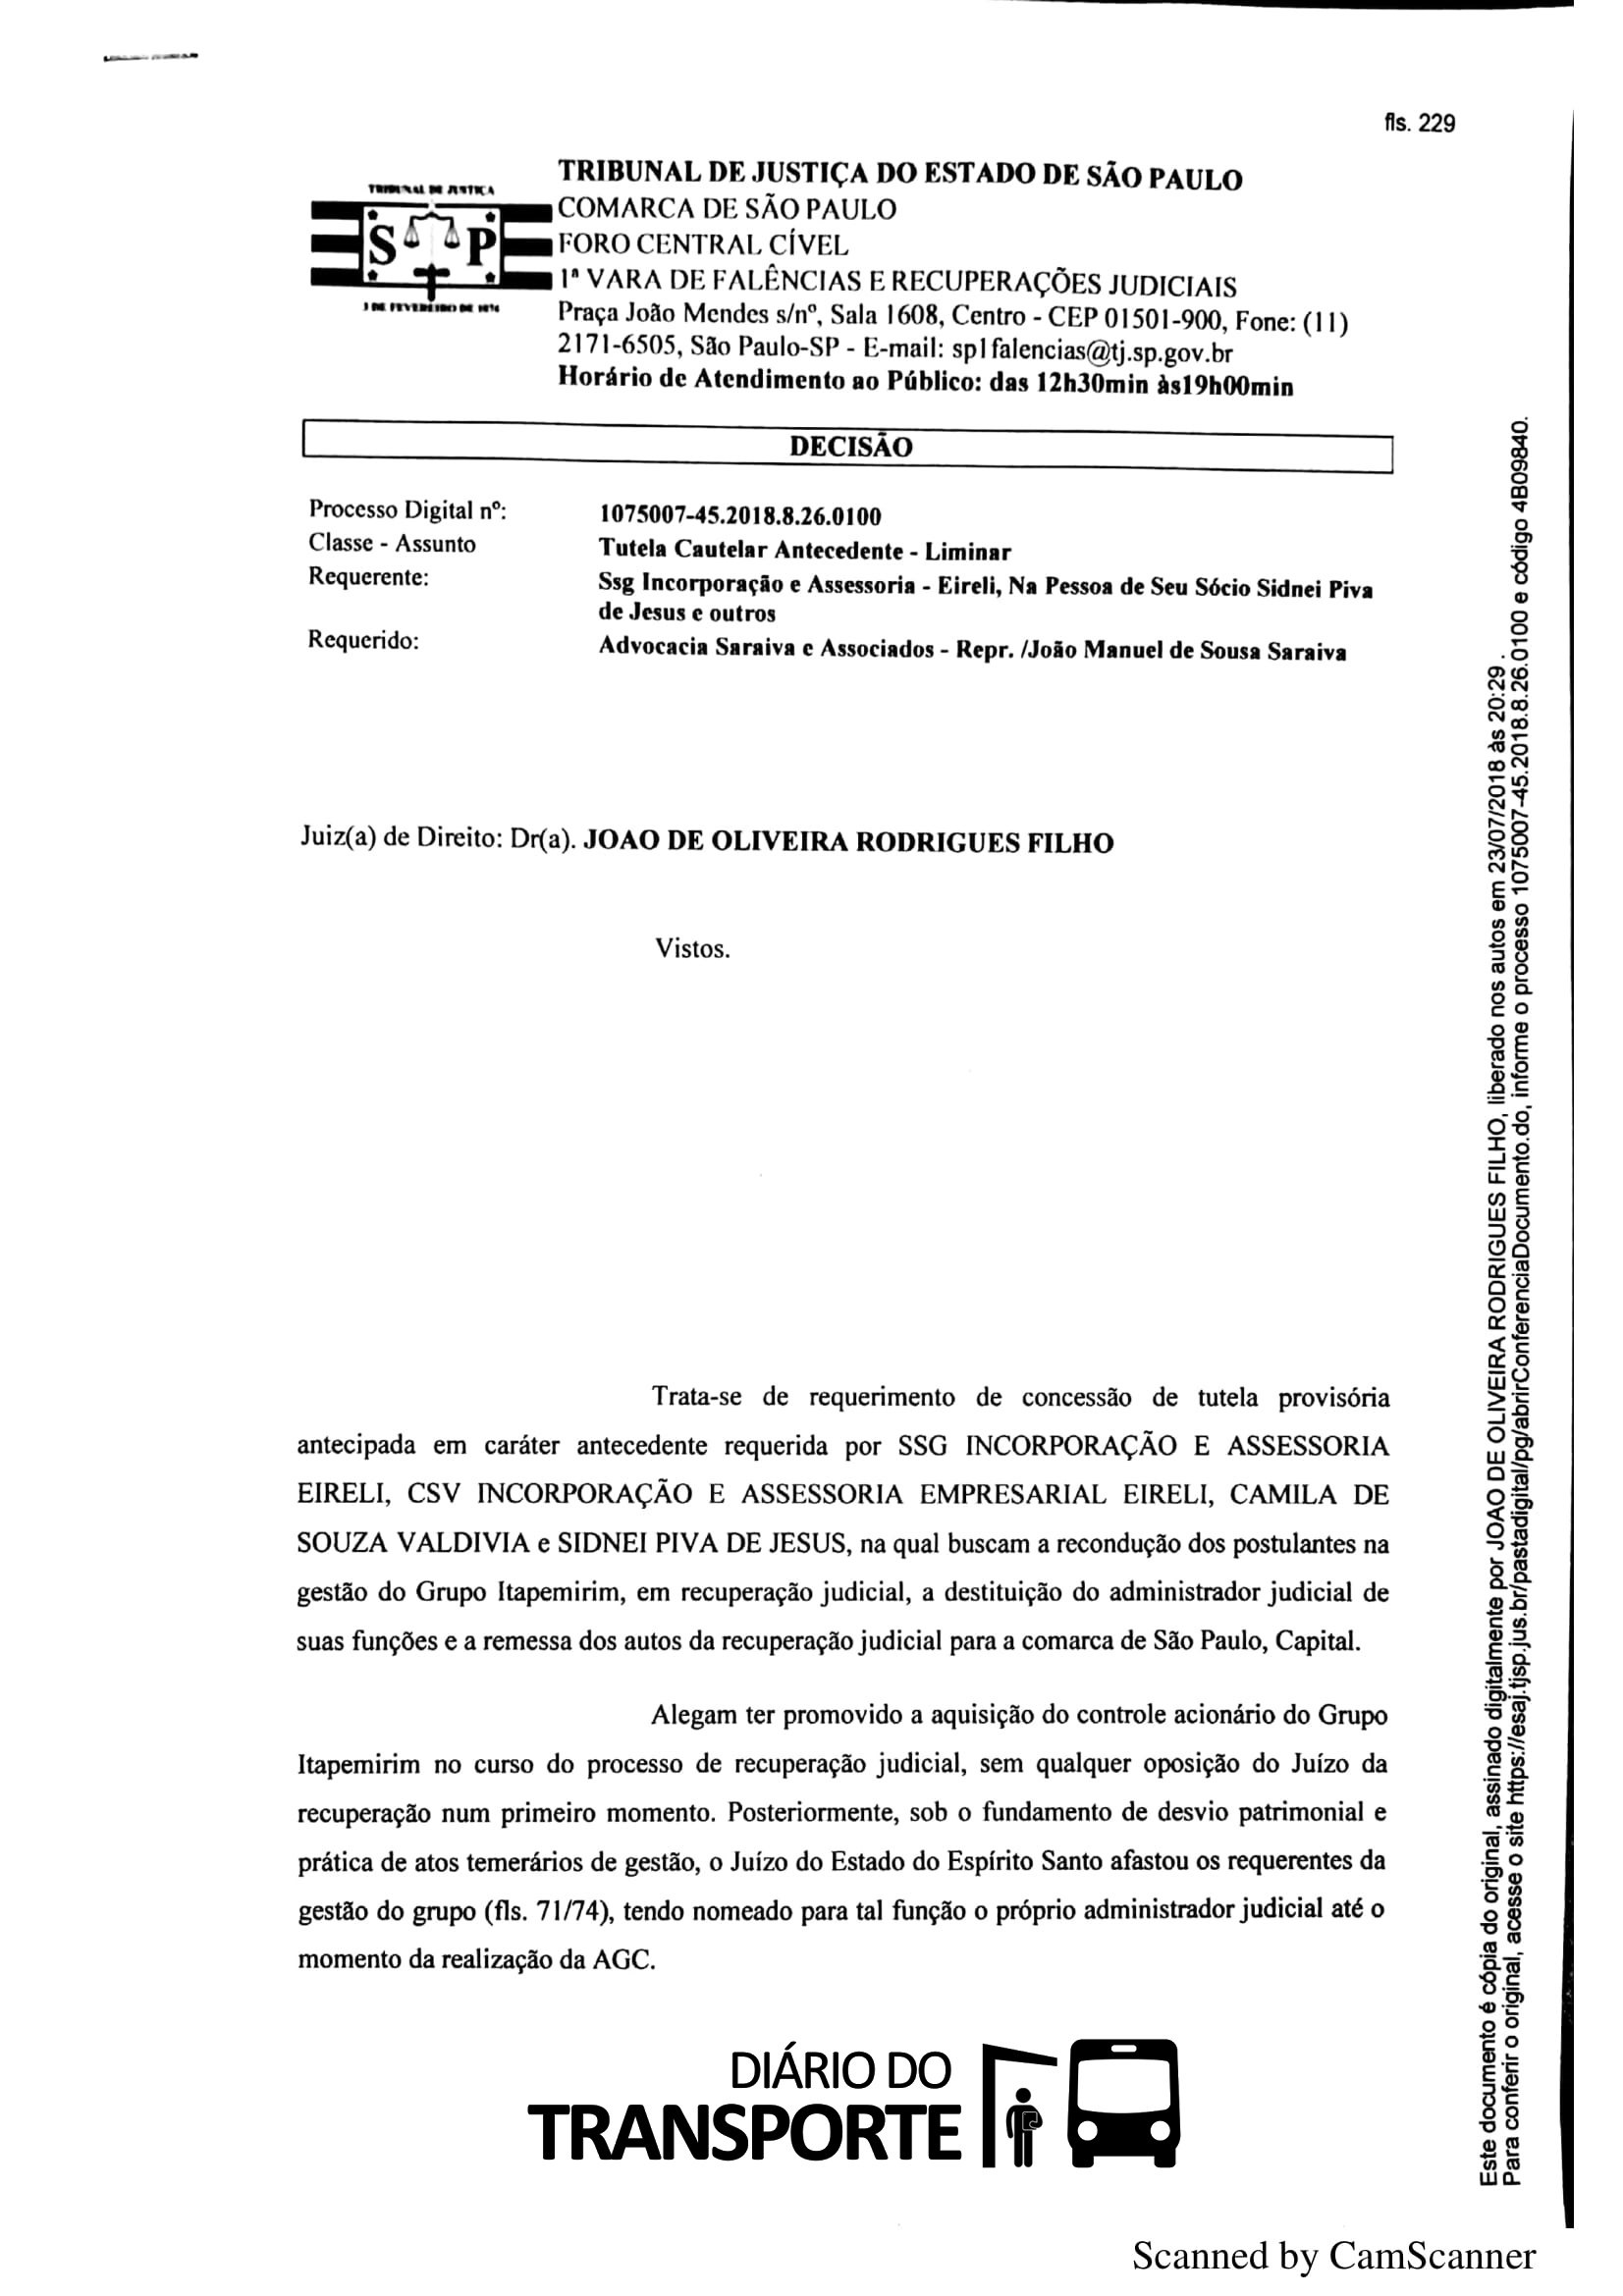 socios_afastados_itapemirim_retorno-1